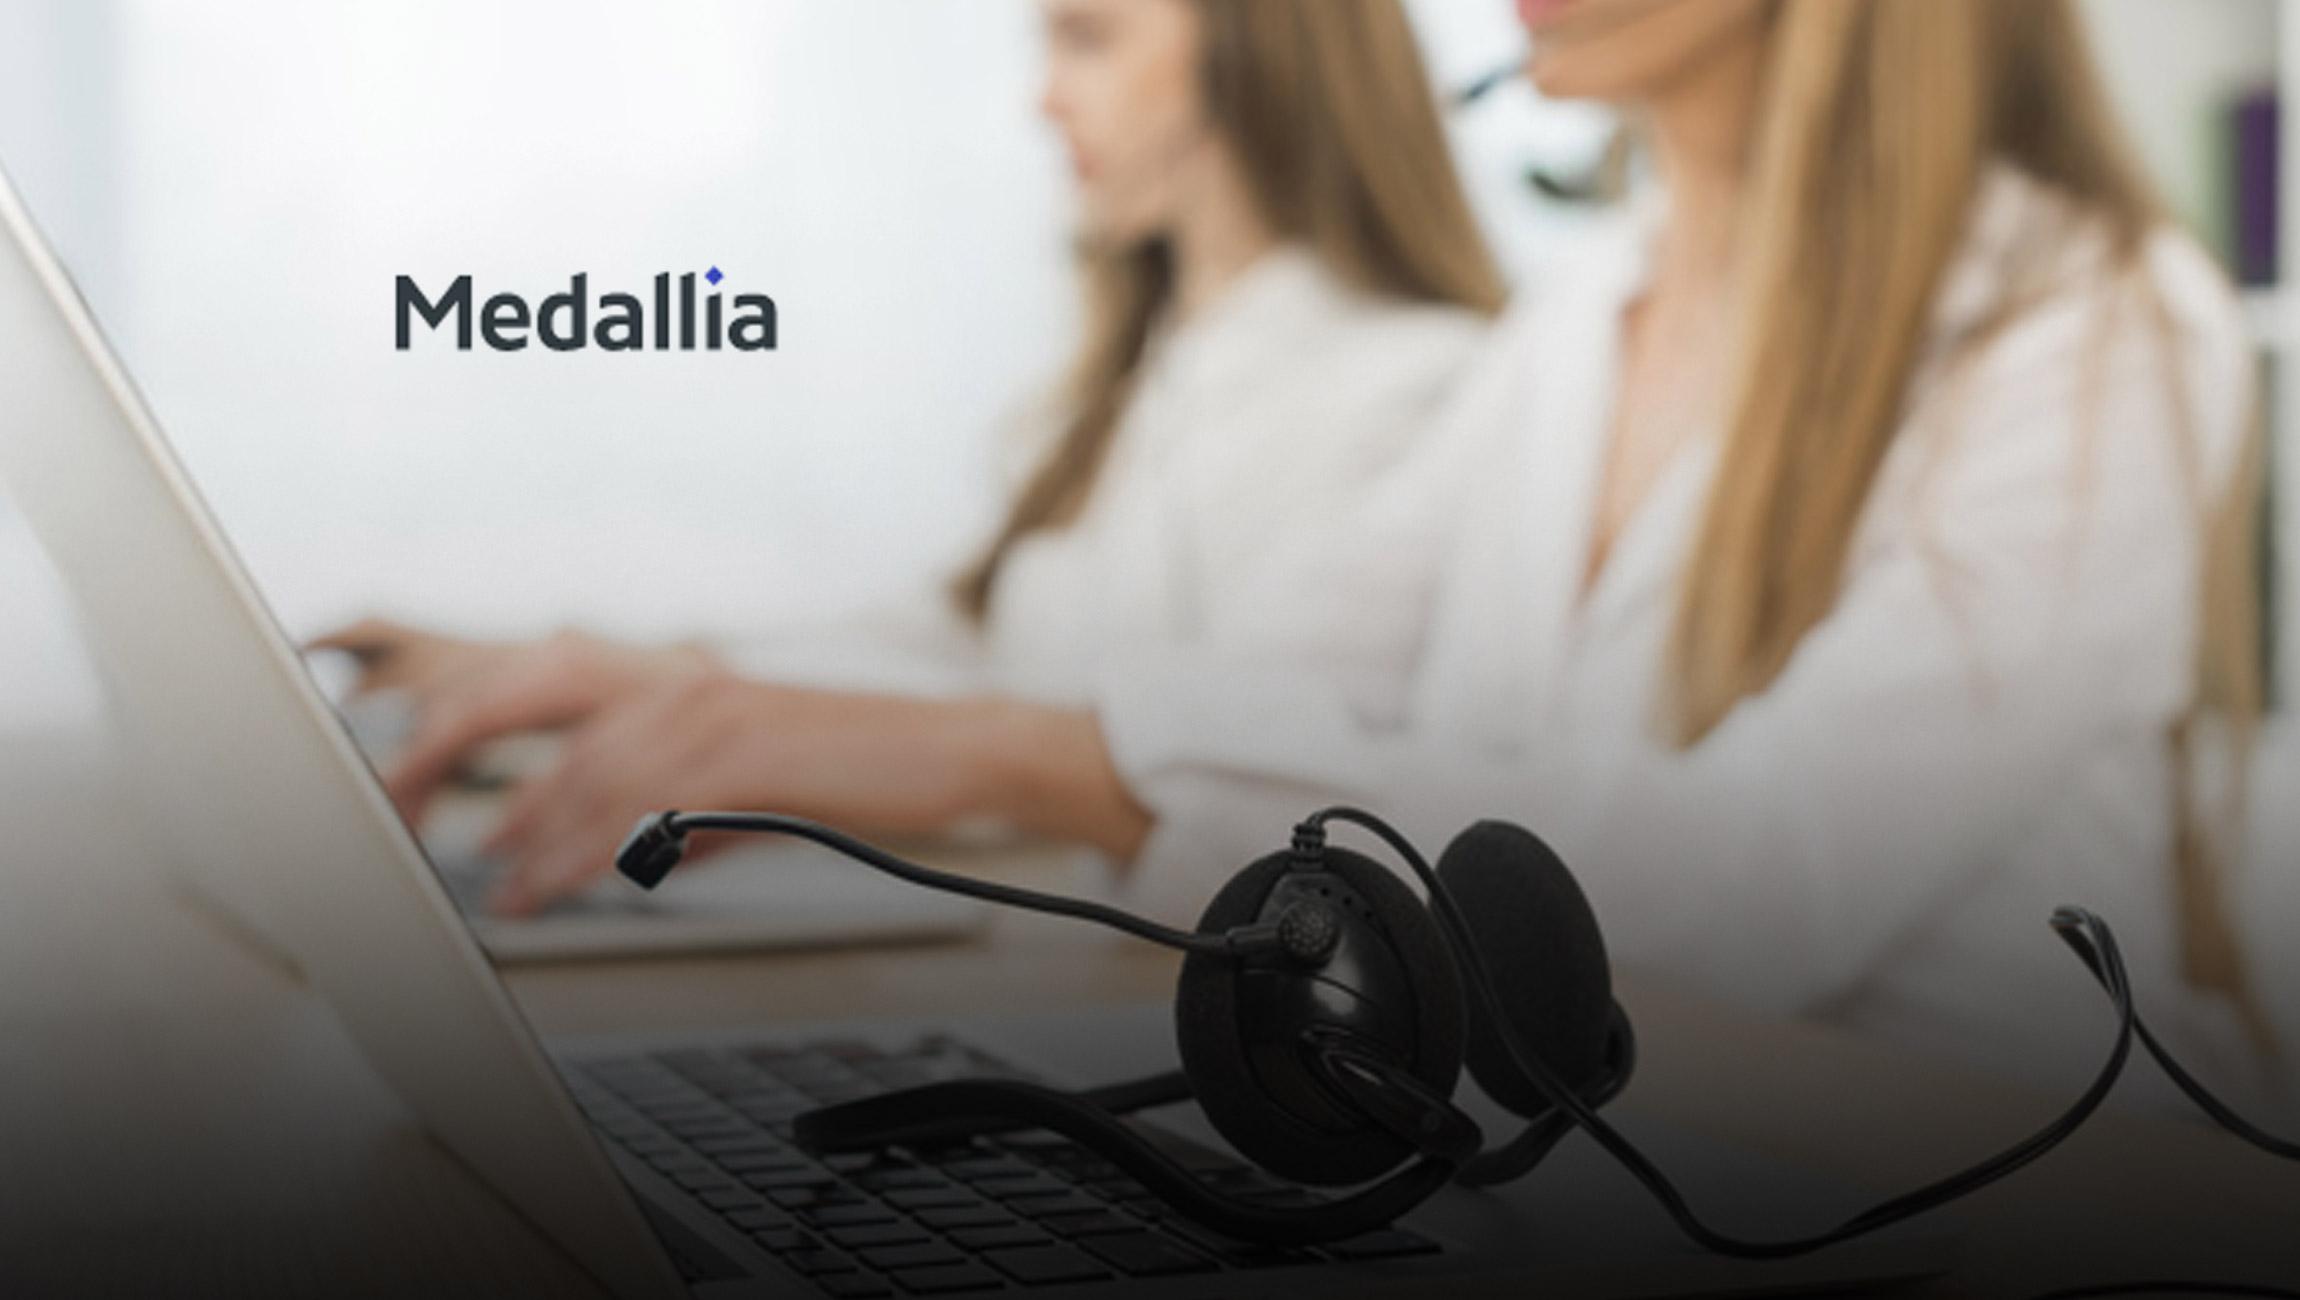 Medallia Announces Medallia Closed Loop Service for Salesforce on Salesforce AppExchange, the World's Leading Enterprise Cloud Marketplace